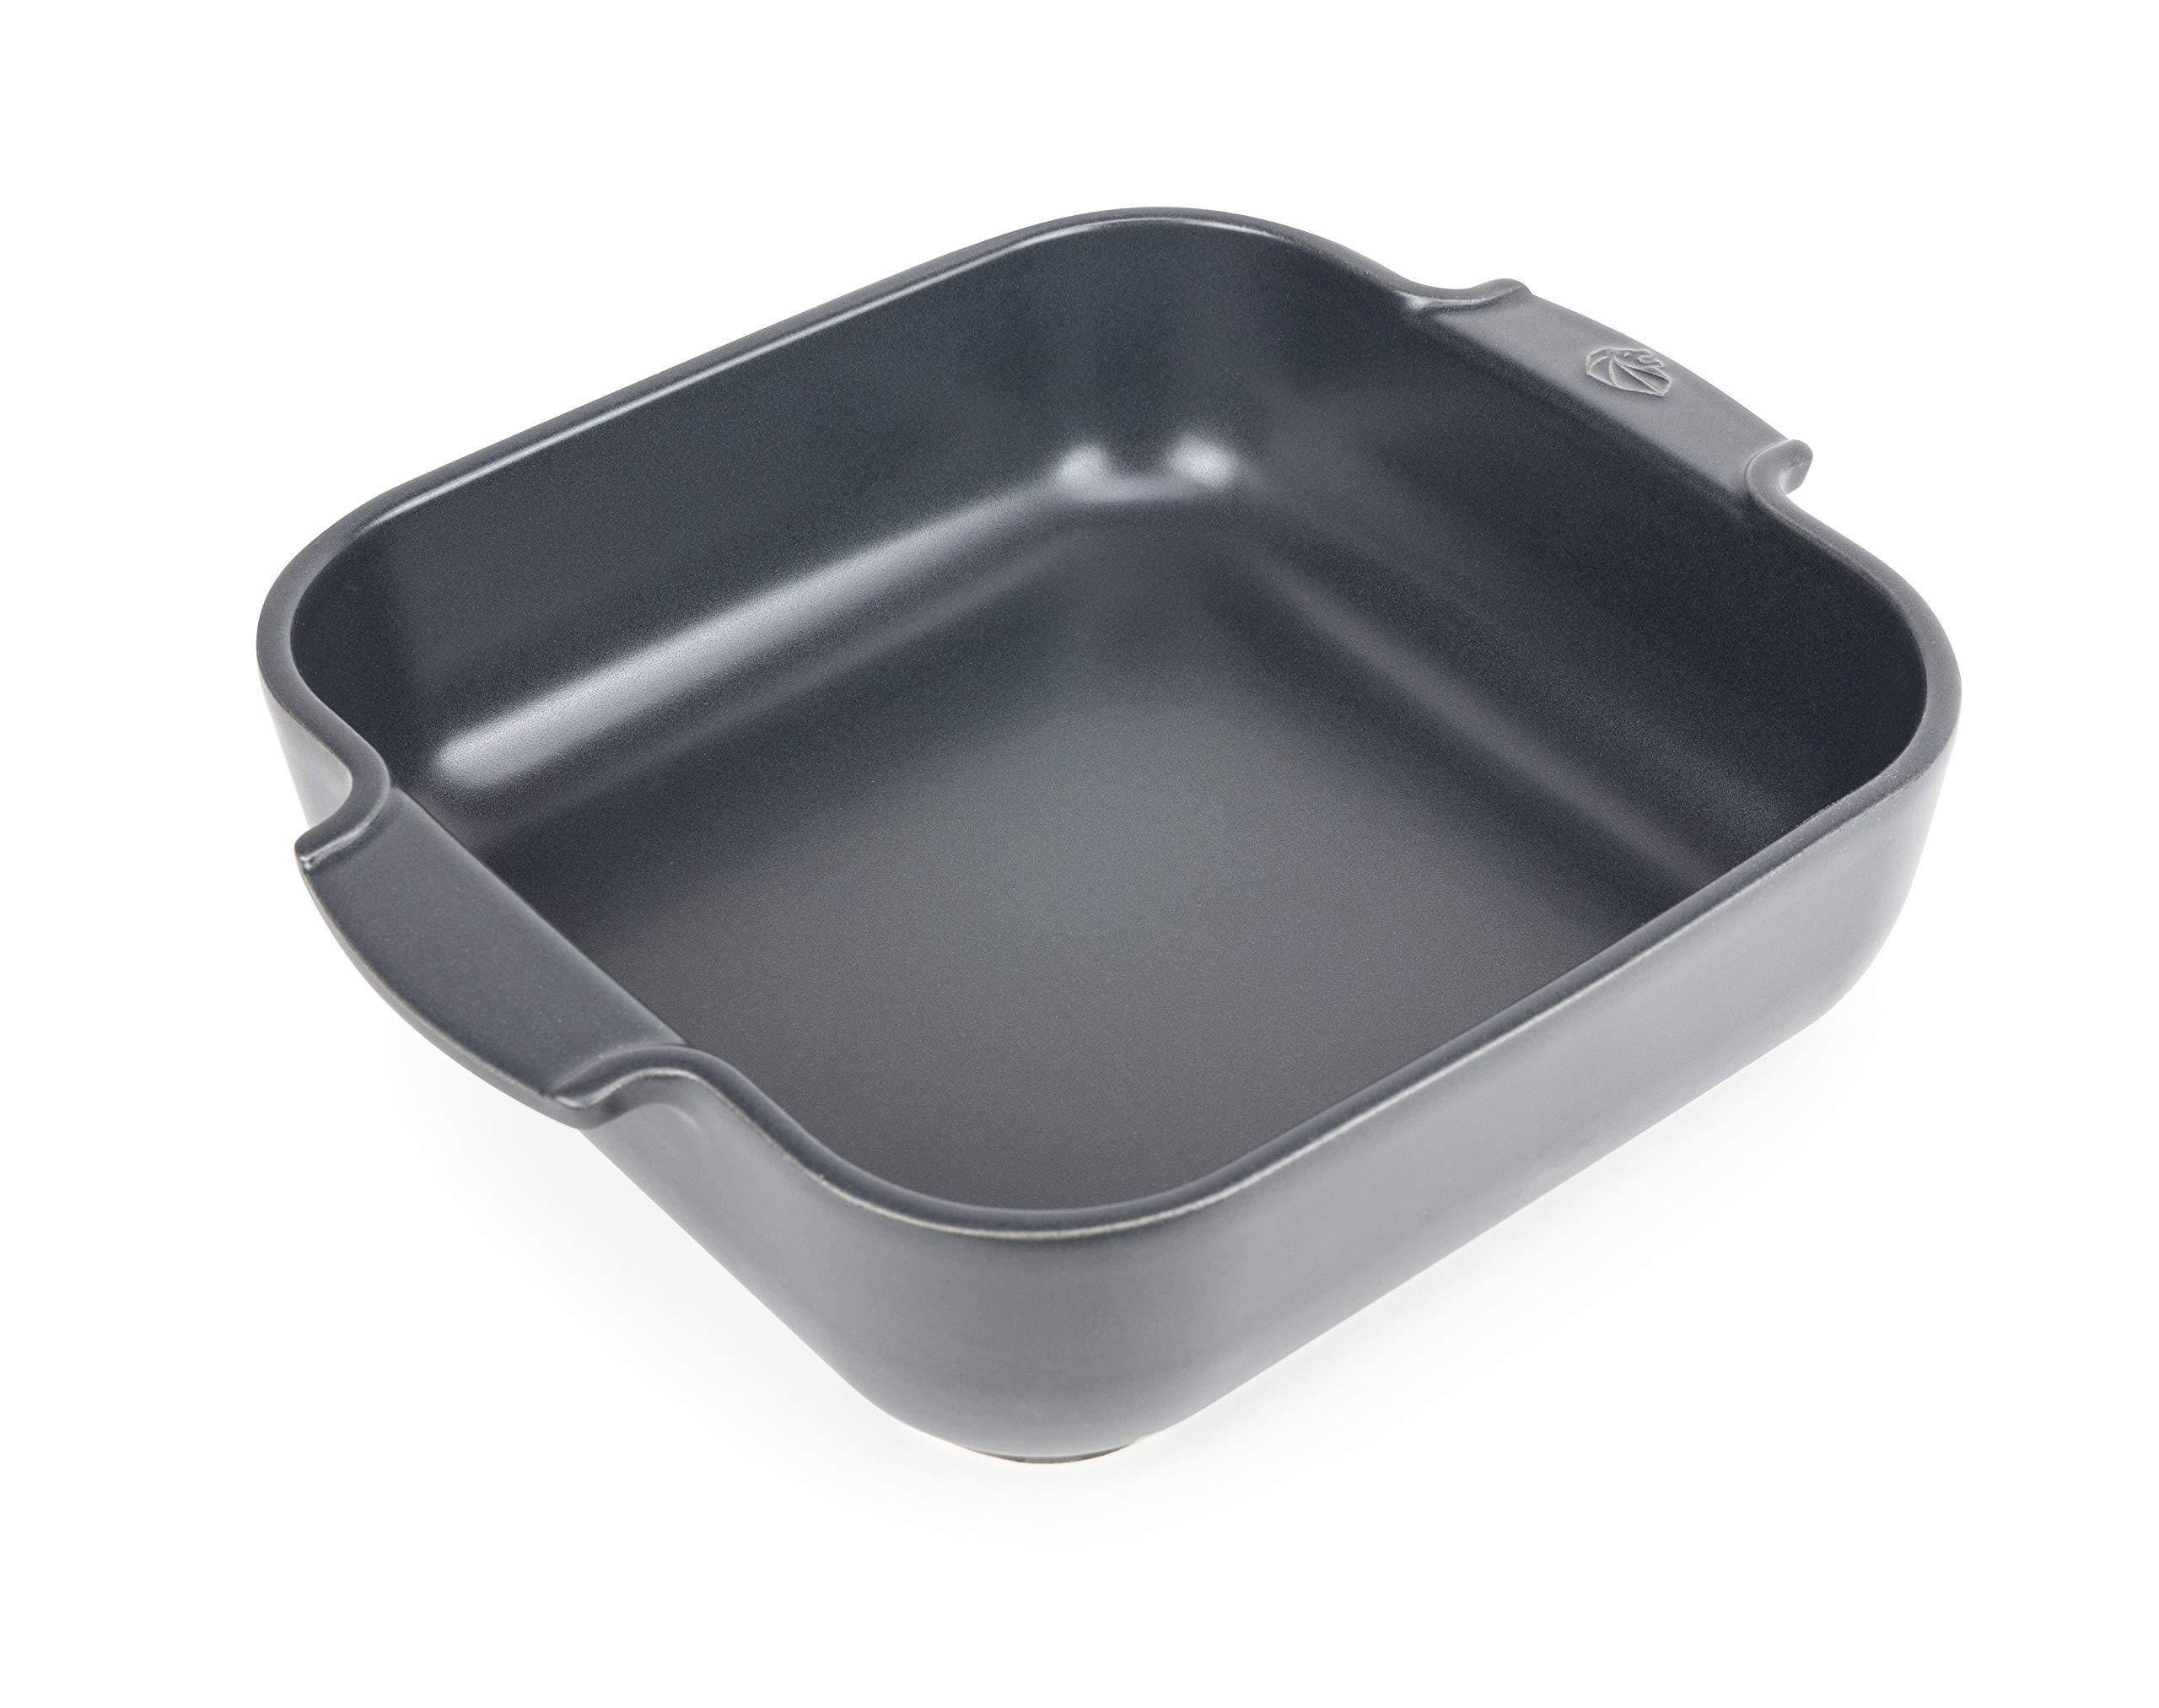 Peugeot Appolia, 28cm Square Baking Dish, 8.8 x 8.8 x 2.6 inch interior, Slate